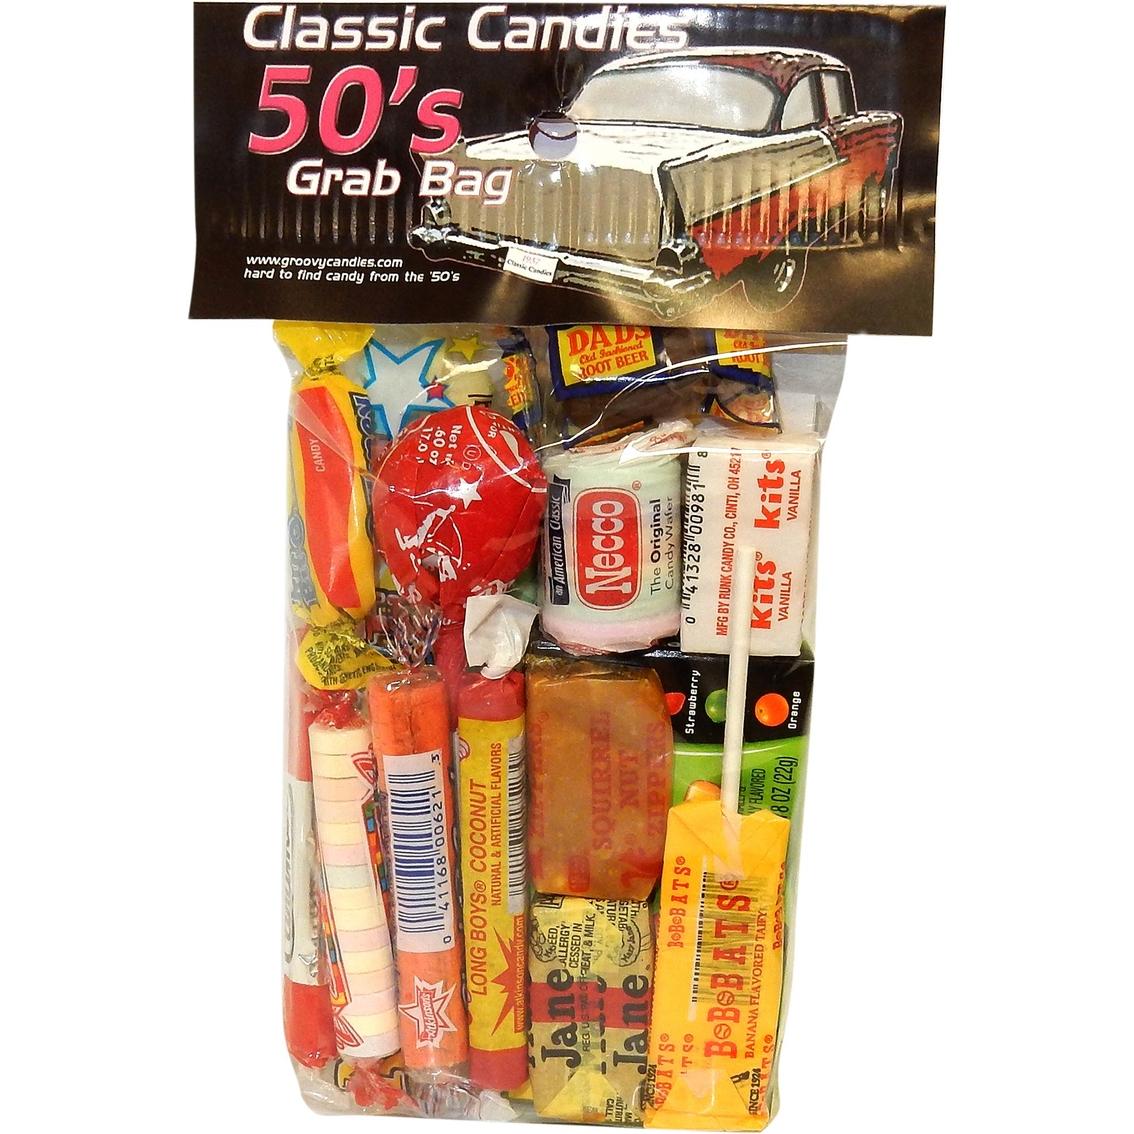 Retro 50s Classic Candy 8 Oz  Grab Bag | Candy & Chocolate